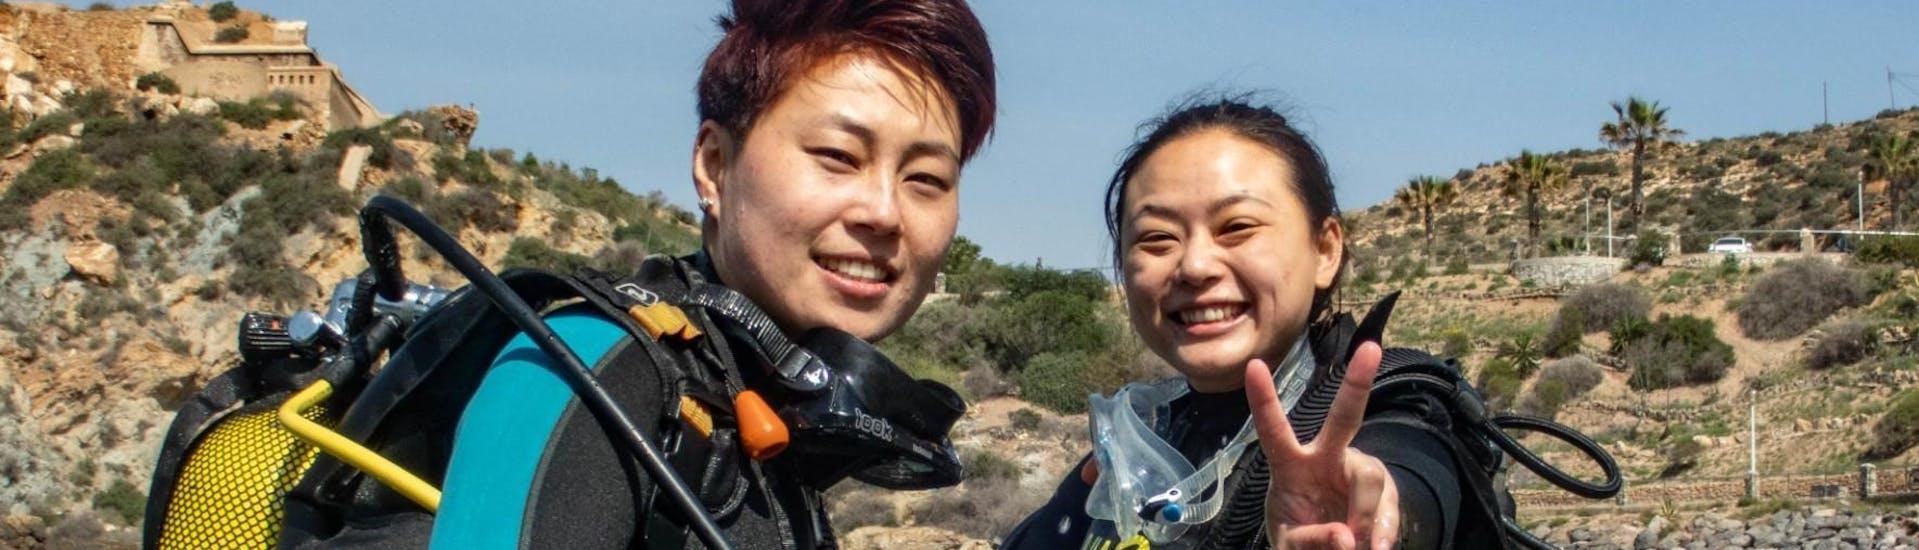 trial-scuba-diving-for-beginners-costa-blanca-dive-academy-santa-pola-hero